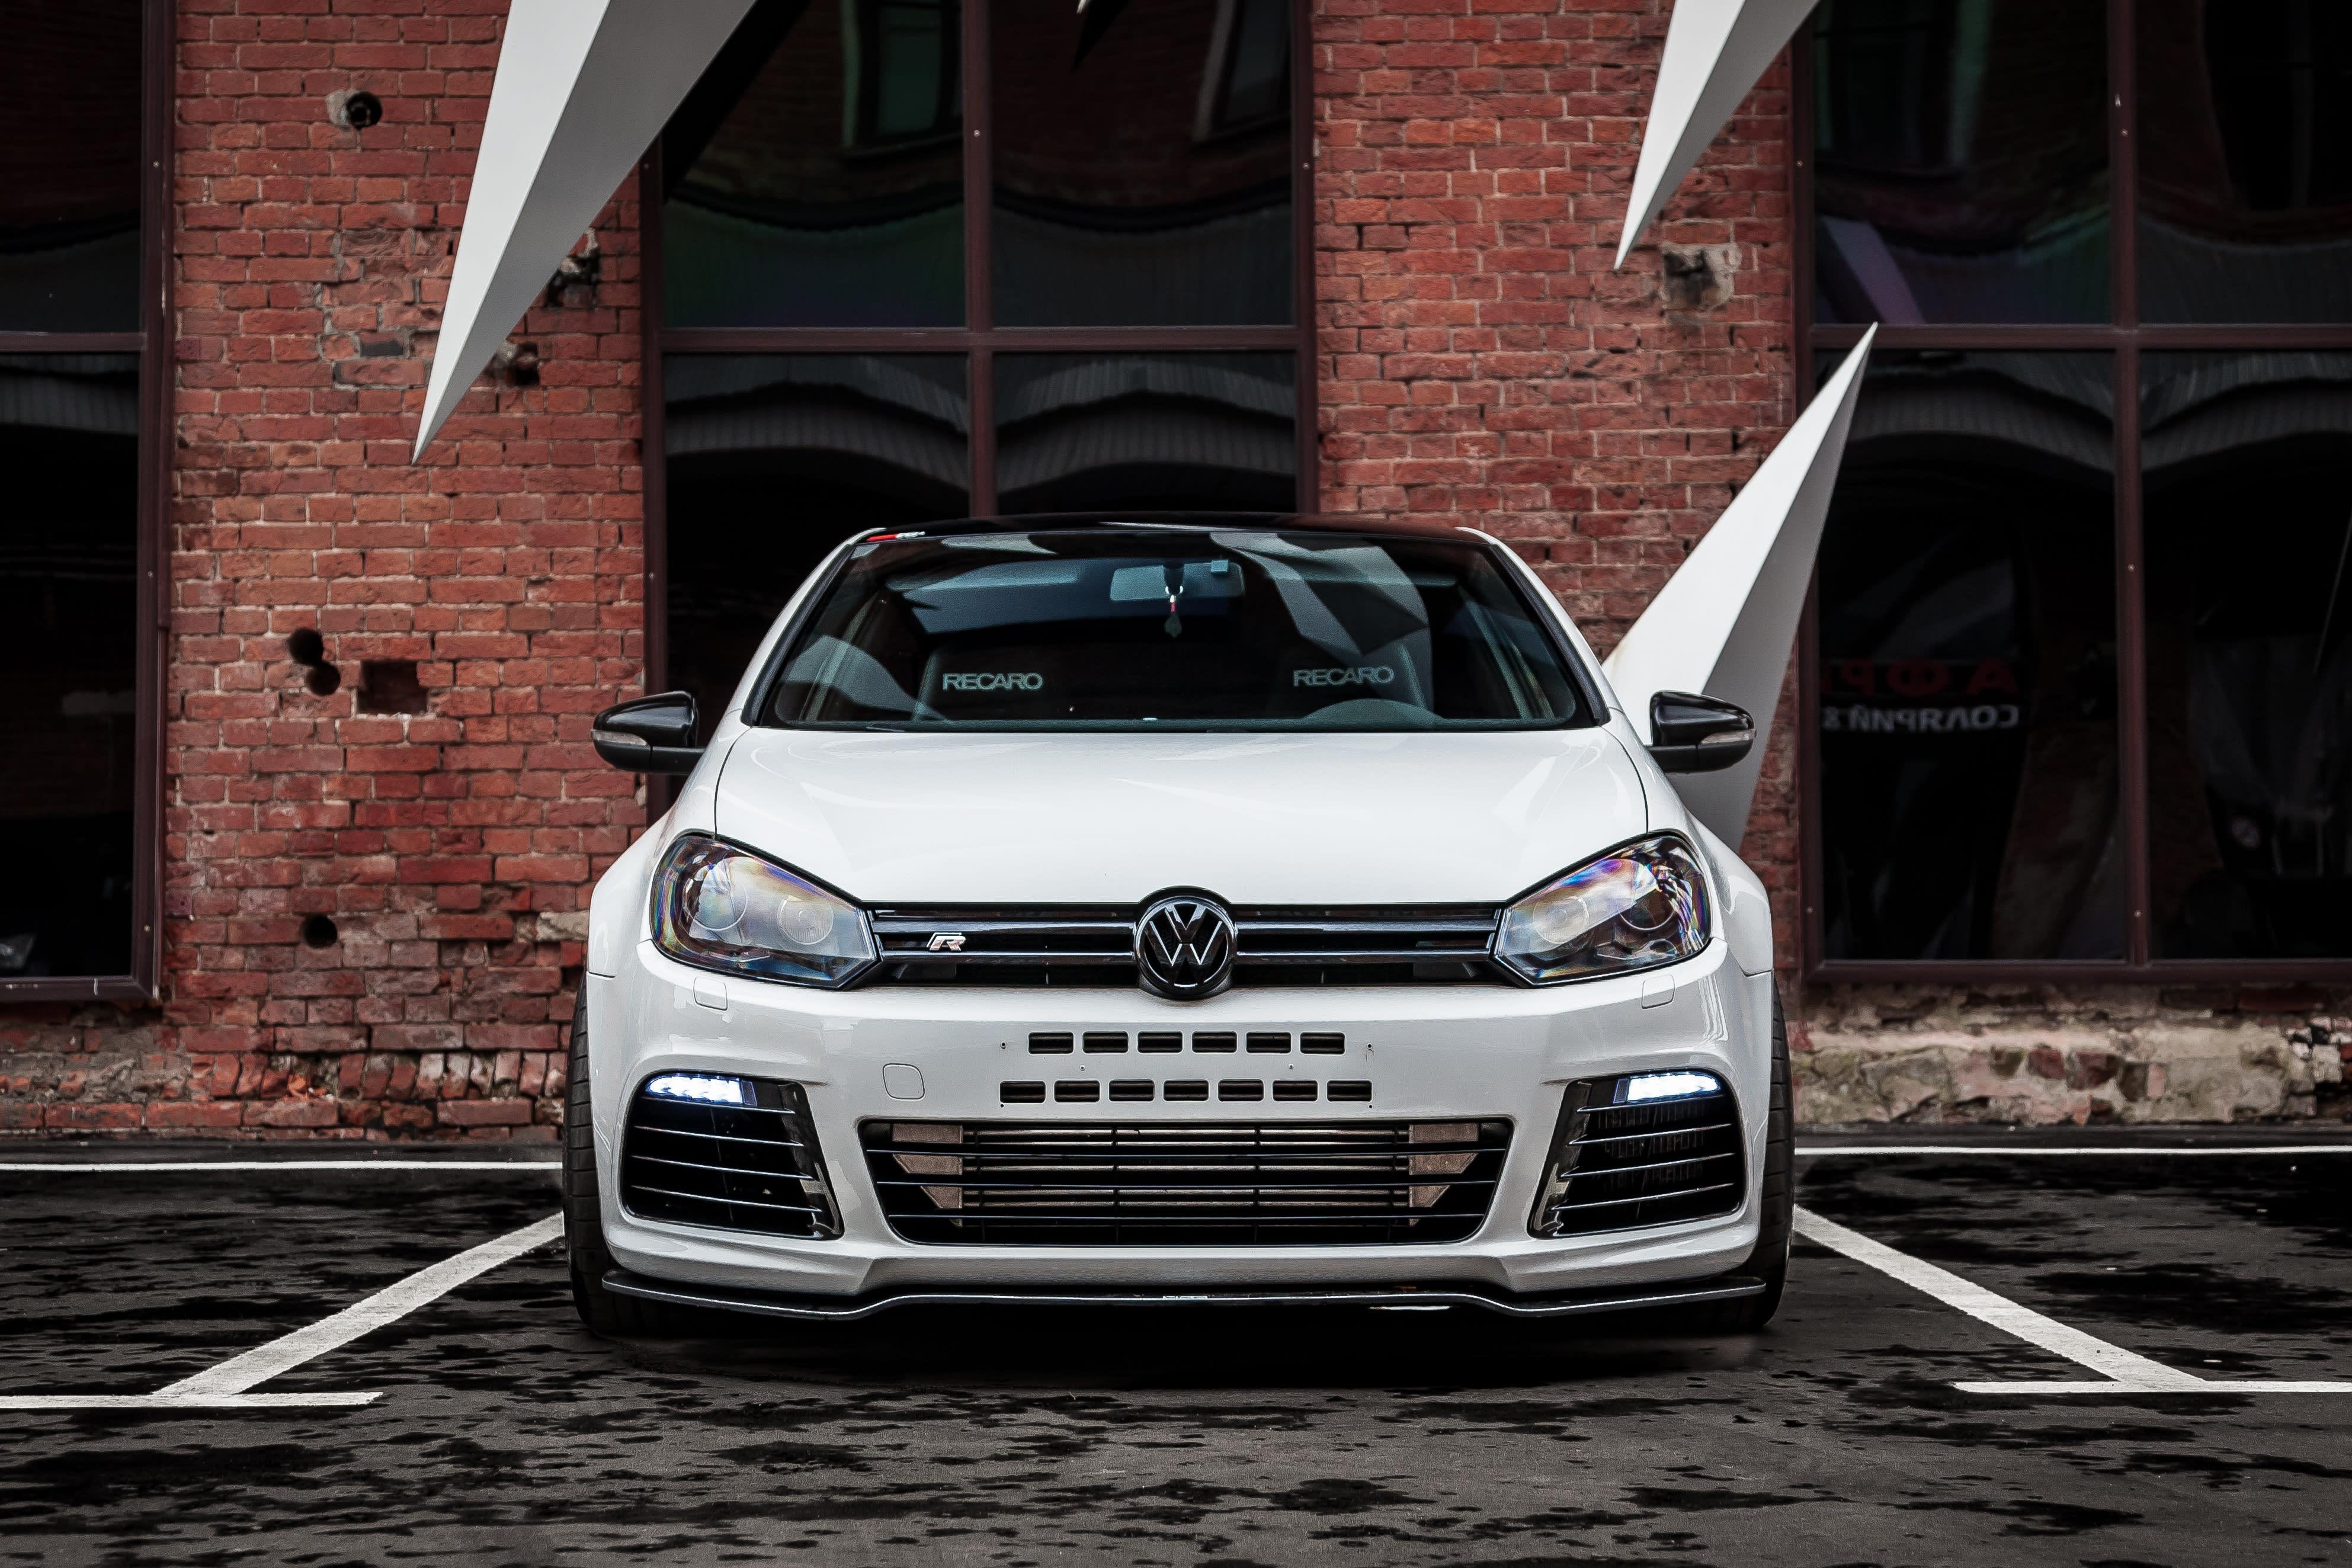 Volkswagen Recalls More Than 500 Golf R Vehicles Due to Potential Fuel Line Break